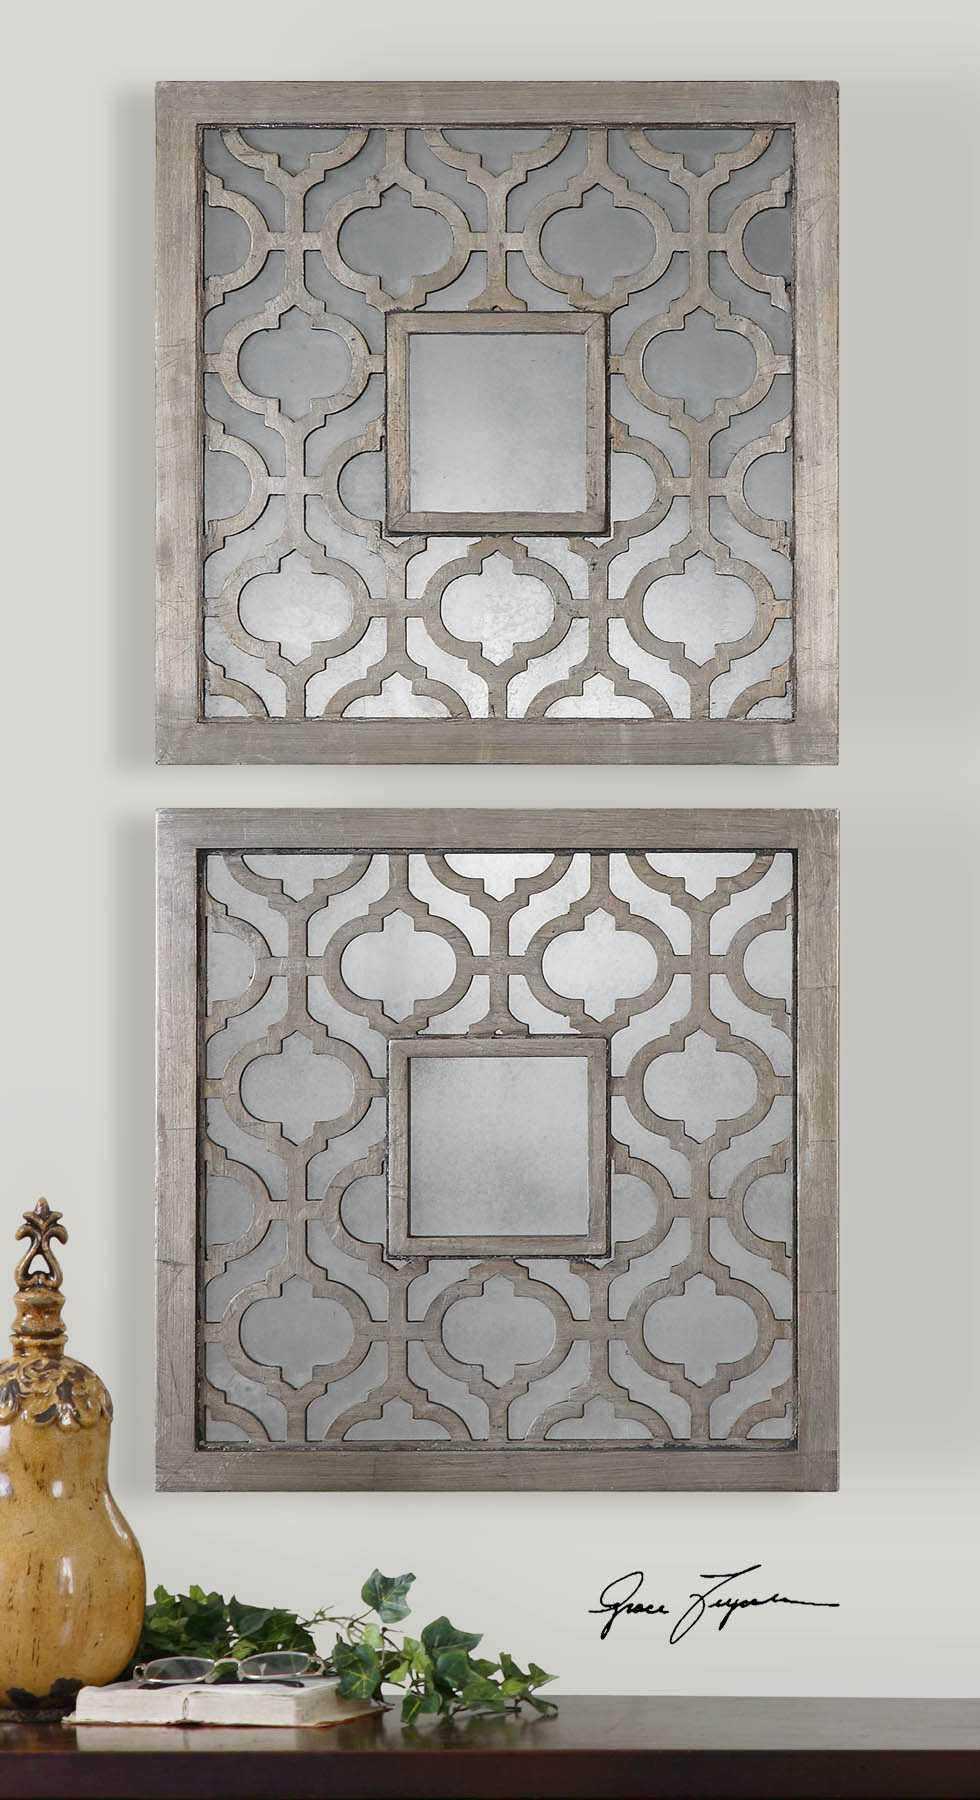 Uttermost Sorbolo 20 x 20 Squares Decorative Wall Mirrors ... on Wall Mirrors Decorative id=67933